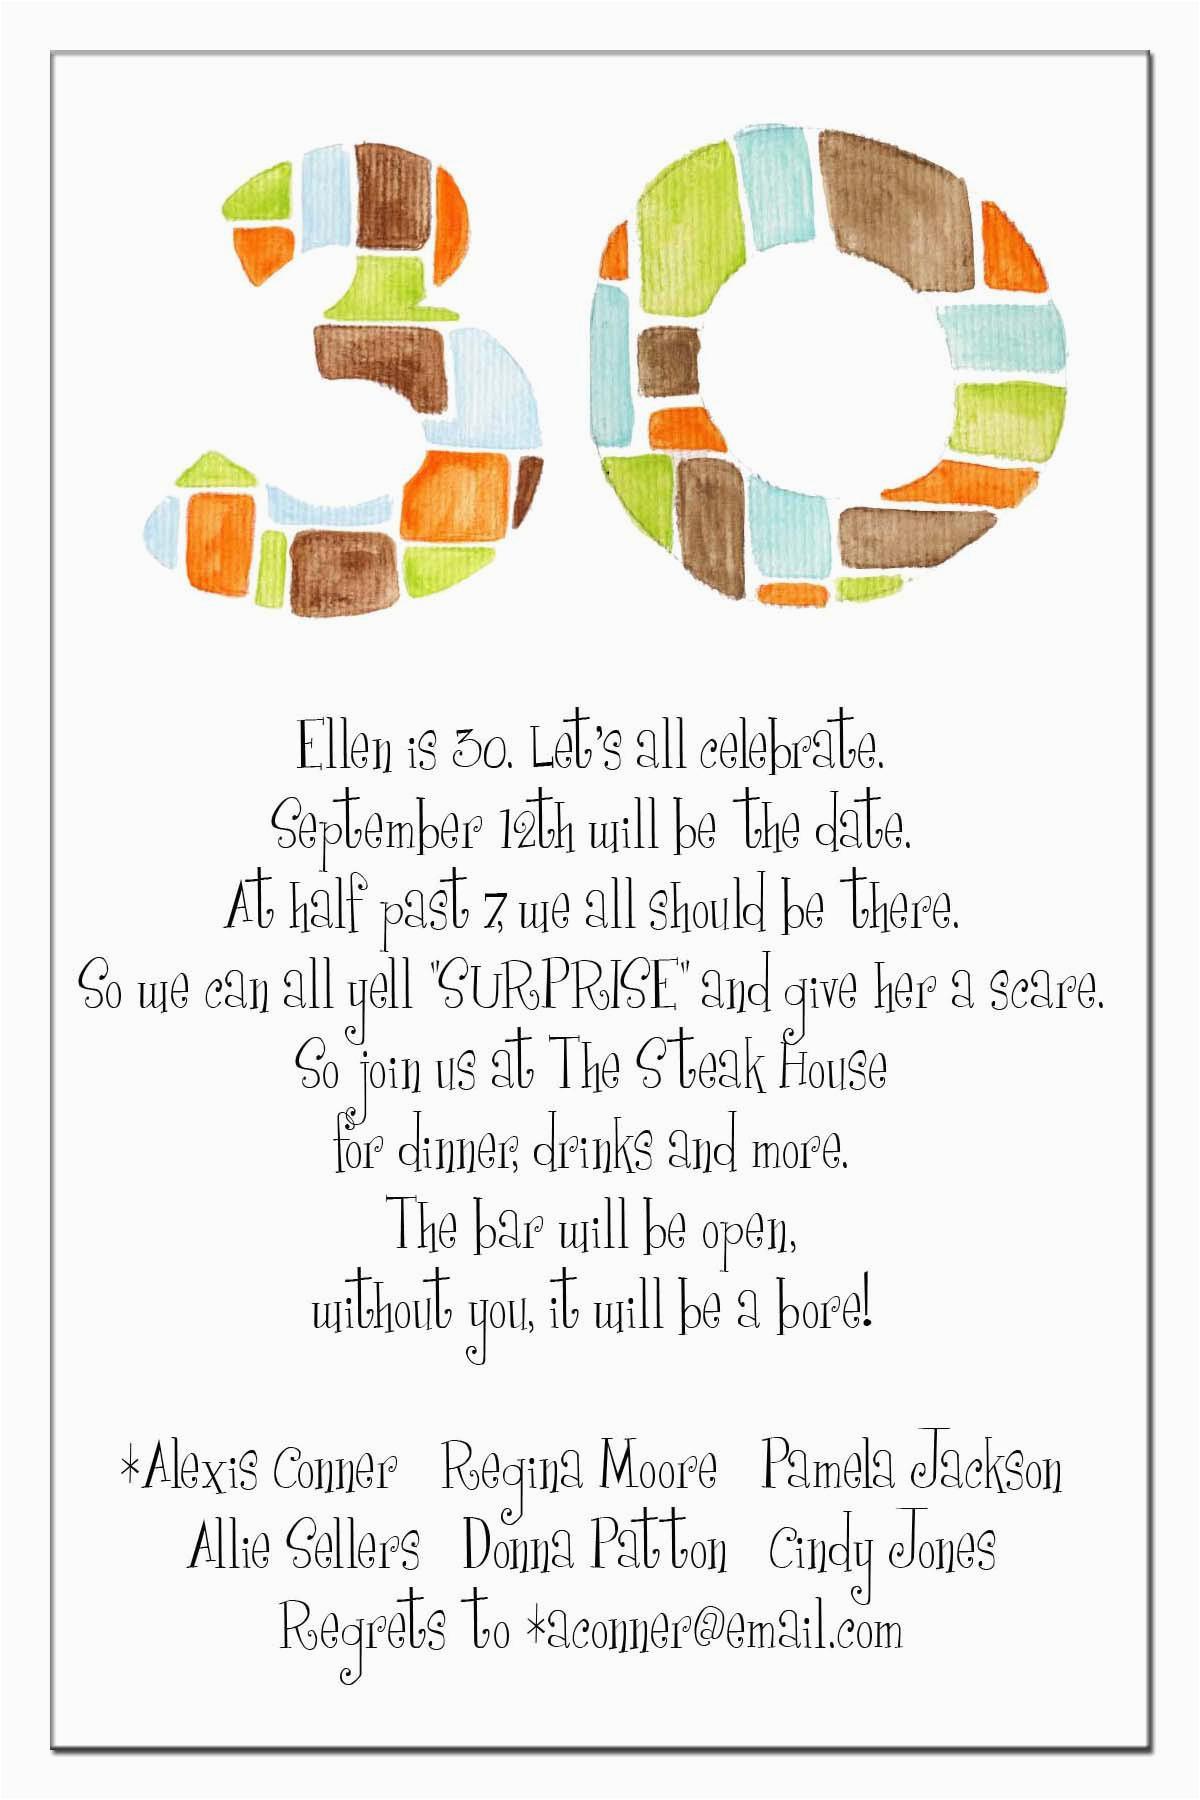 30th Birthday Invitation Sayings 20 Interesting Invitations Themes Wording